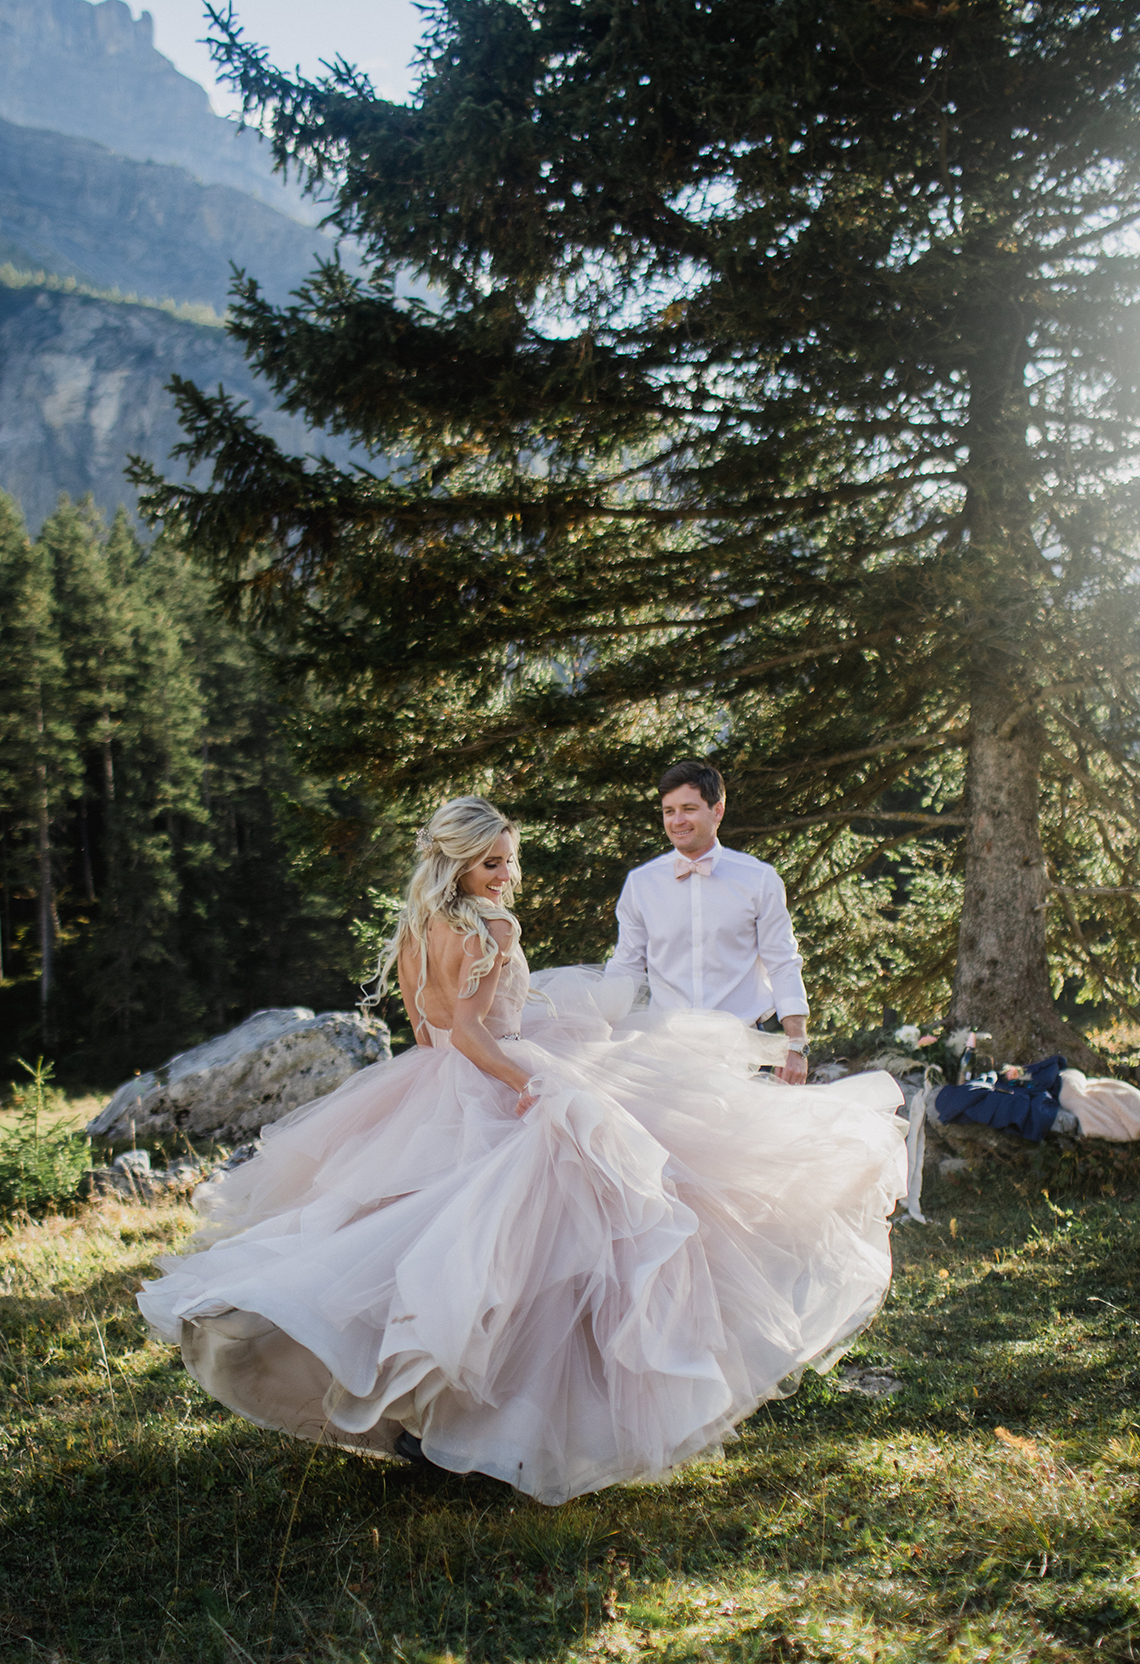 Amazing Adventurous Swiss Alps Mountain Wedding – Unveiled Radiance Photography 67